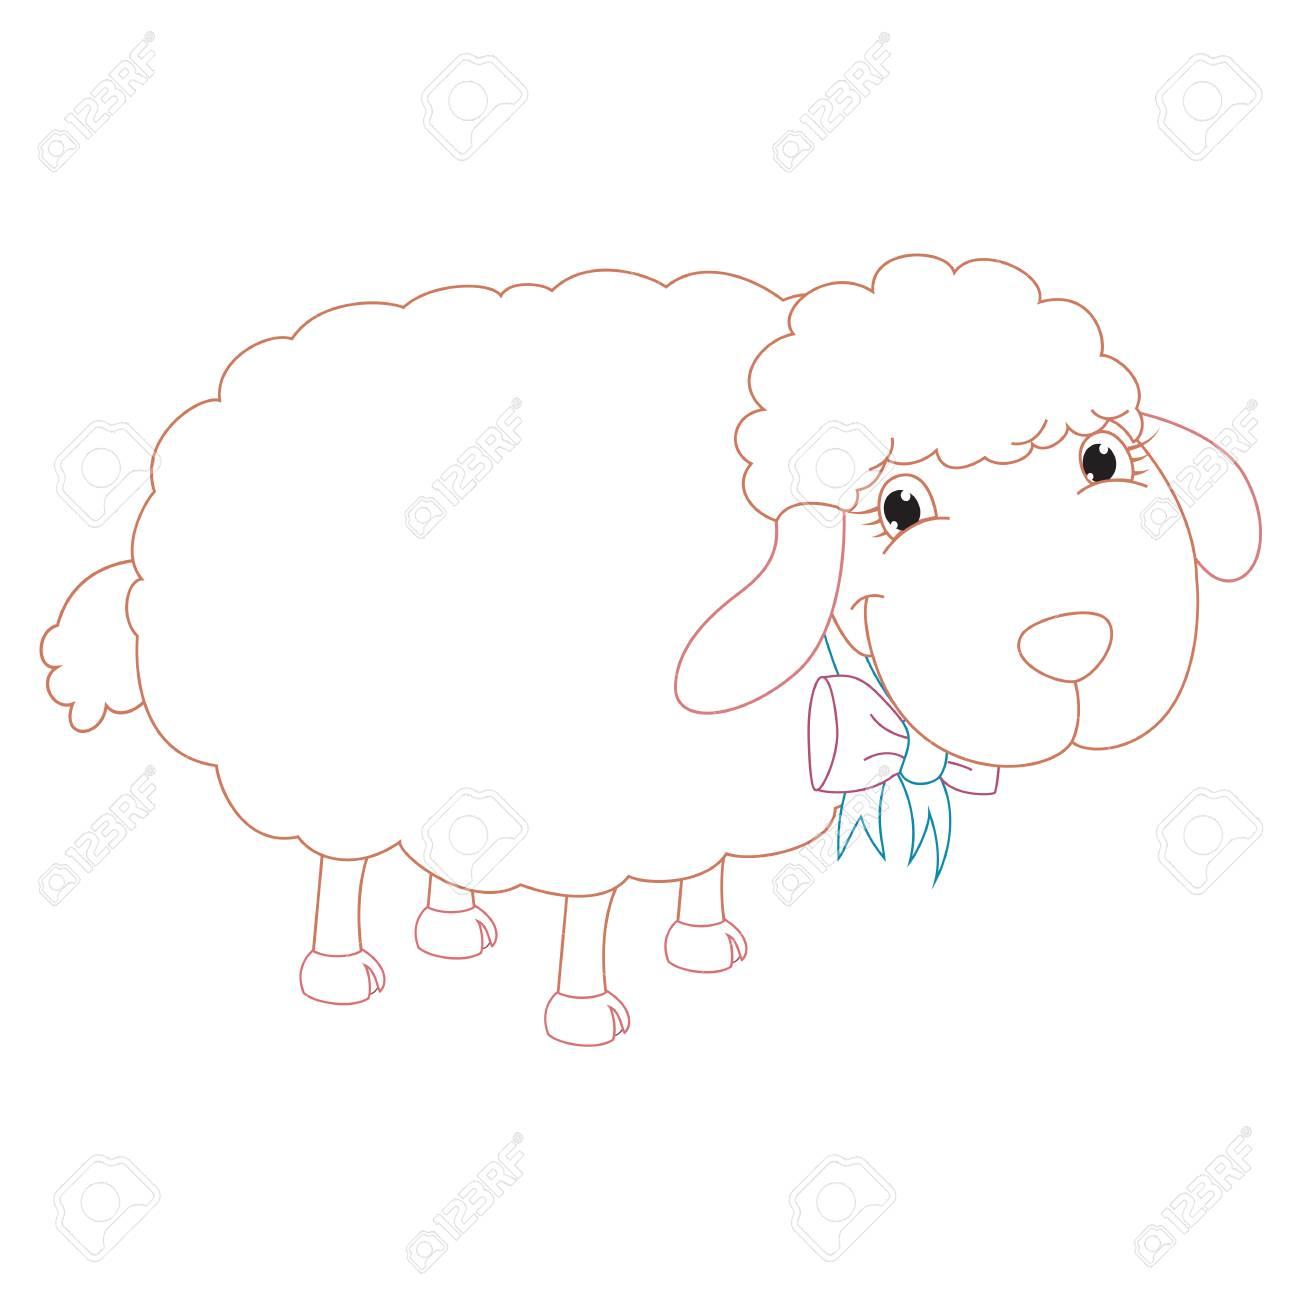 Cartoon Sheep, Coloring Page Illustration